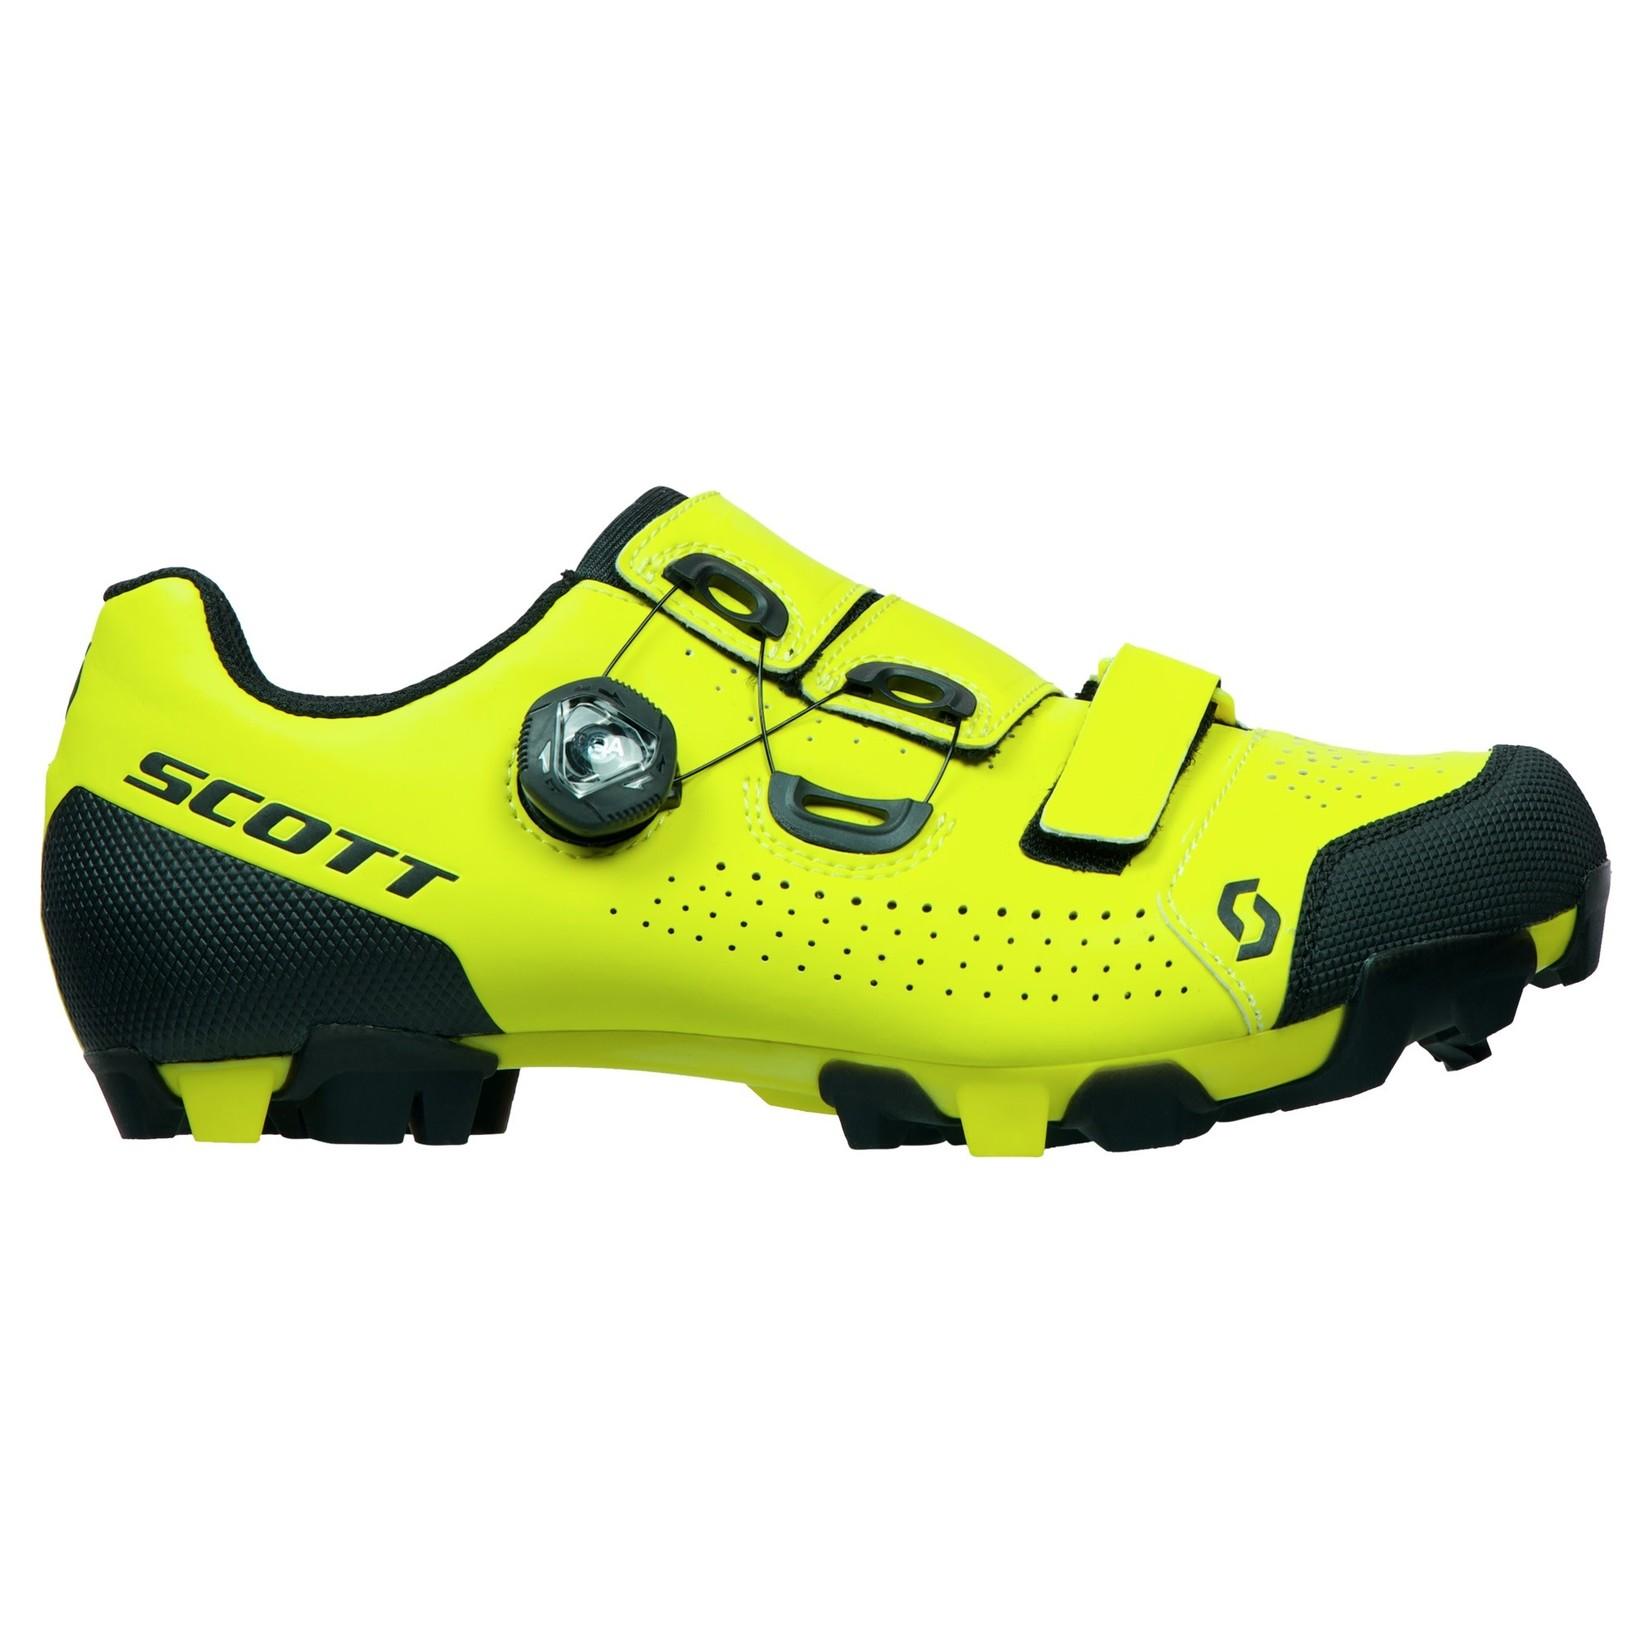 Scott SCOTT MTB TEAM BOA® SHOE Yellow